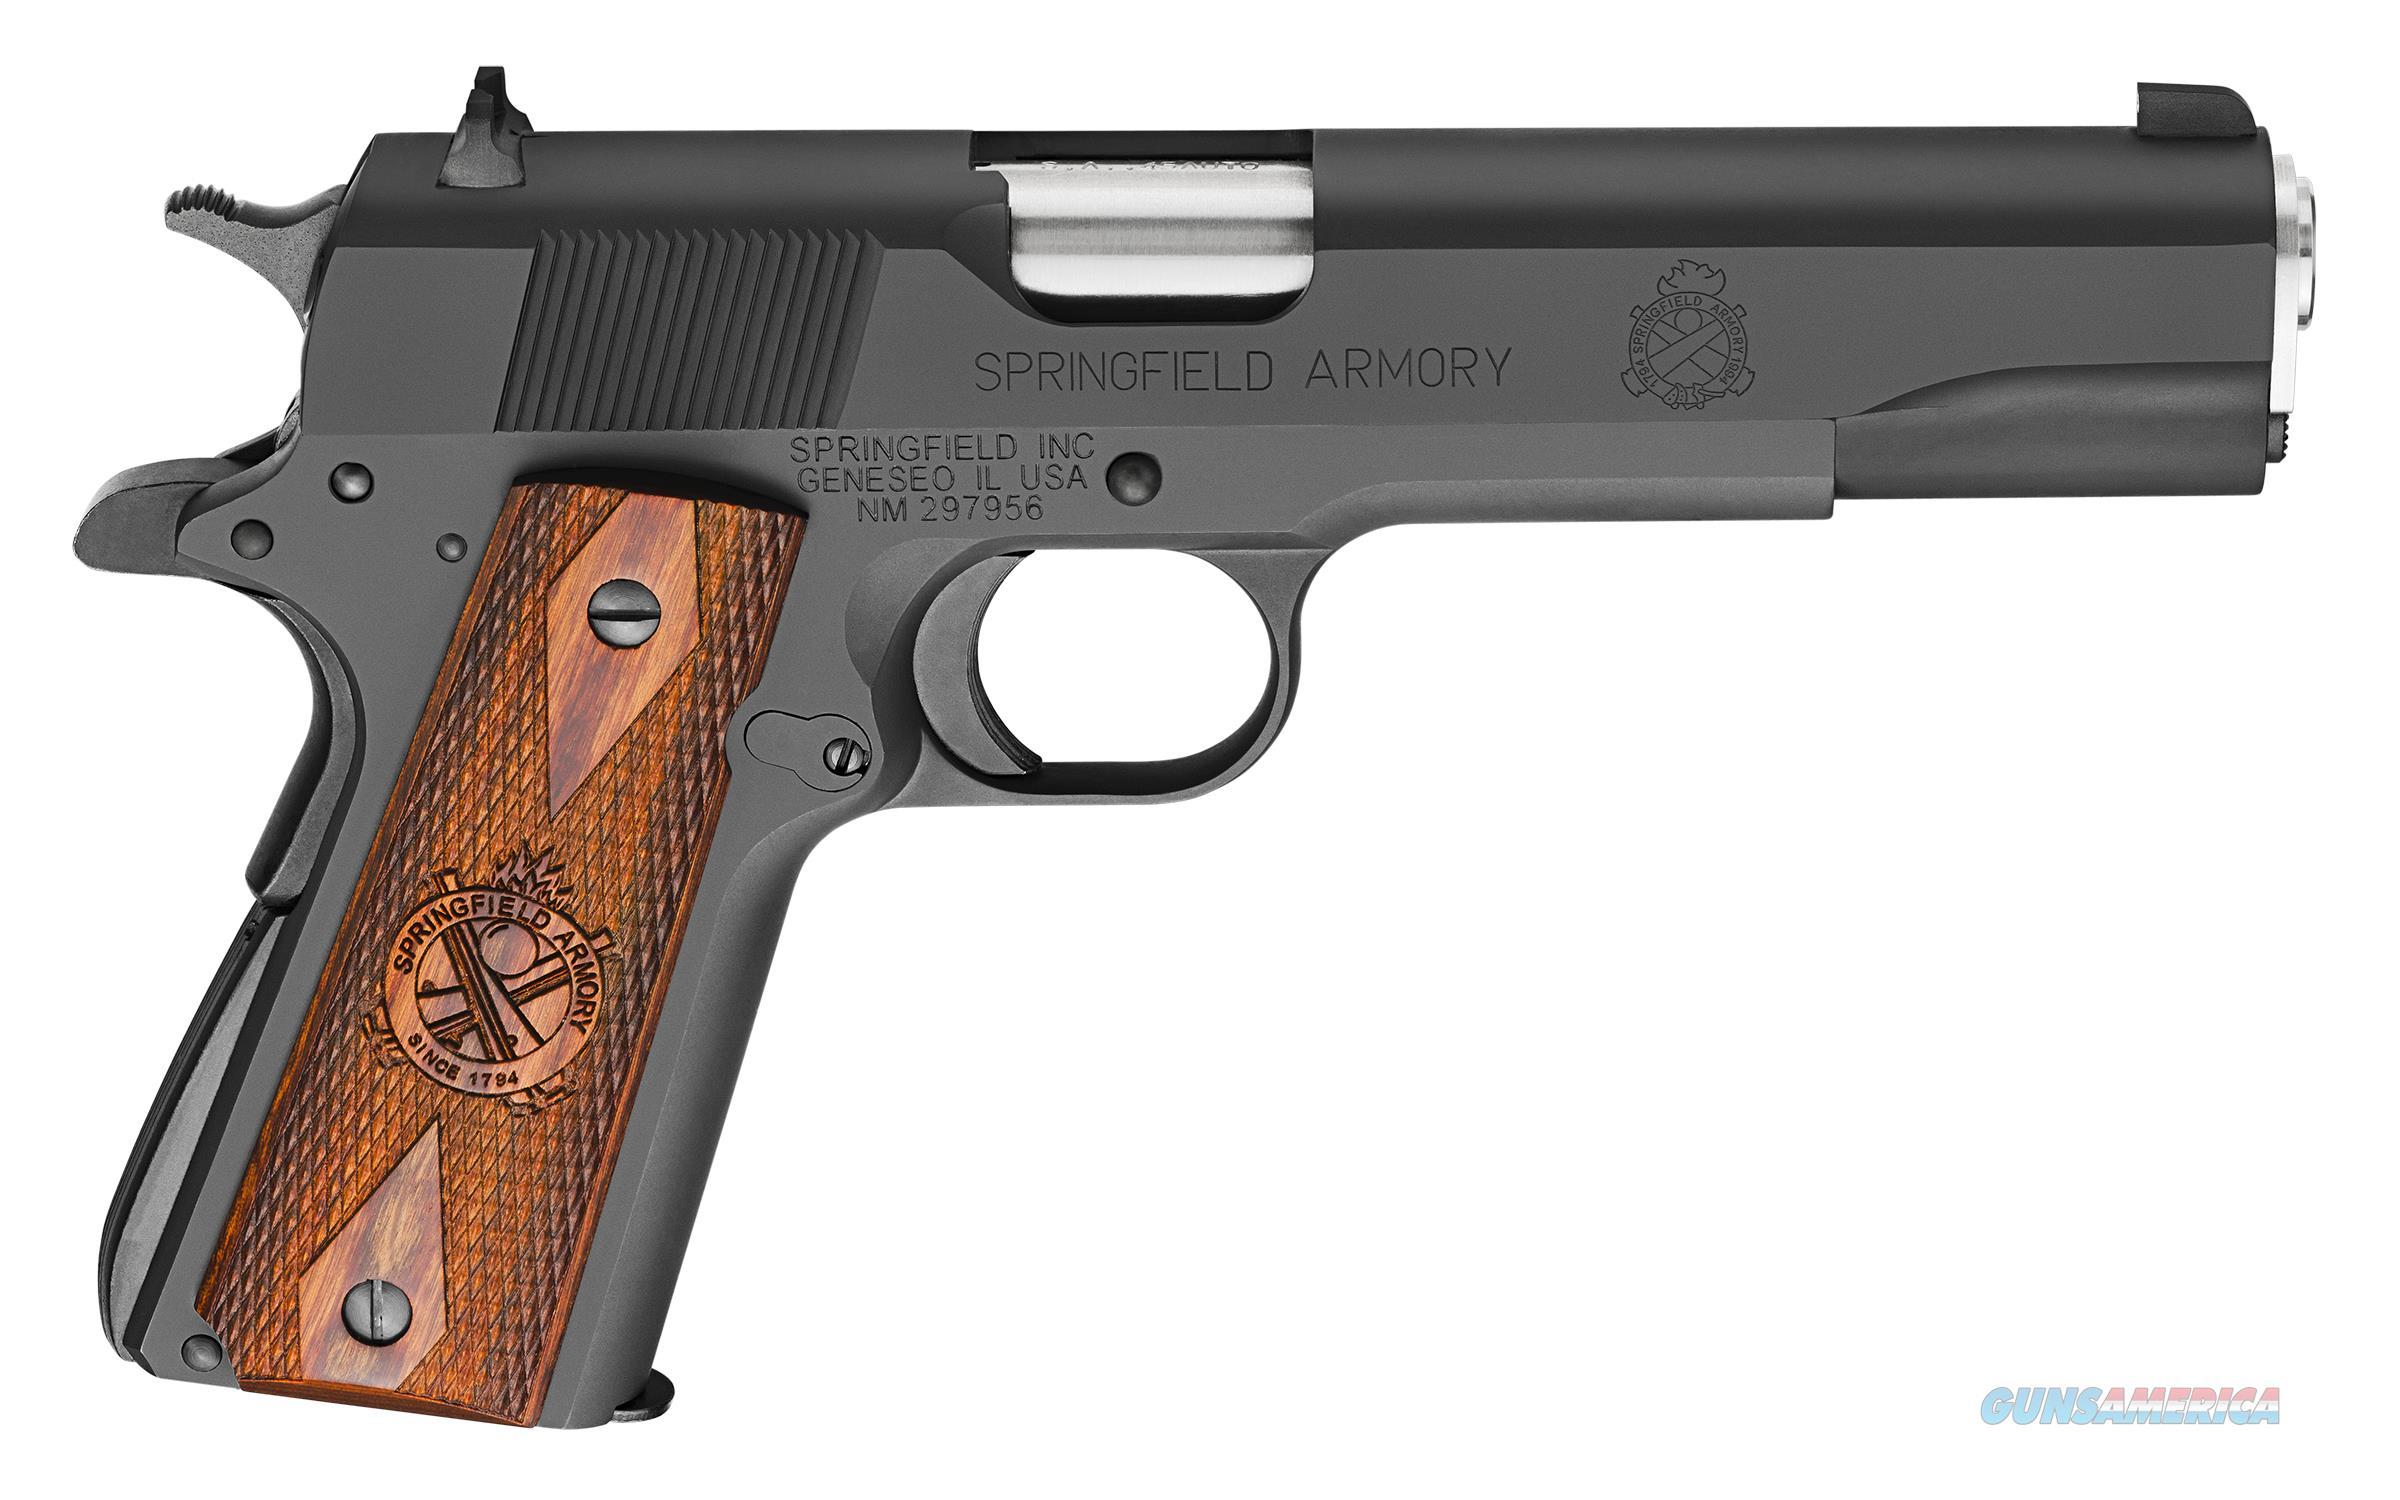 "Springfield Armory 1911 Mil-Spec Parkerized .45 ACP 5"" 7 Rds PB9108L   Guns > Pistols > Springfield Armory Pistols > 1911 Type"